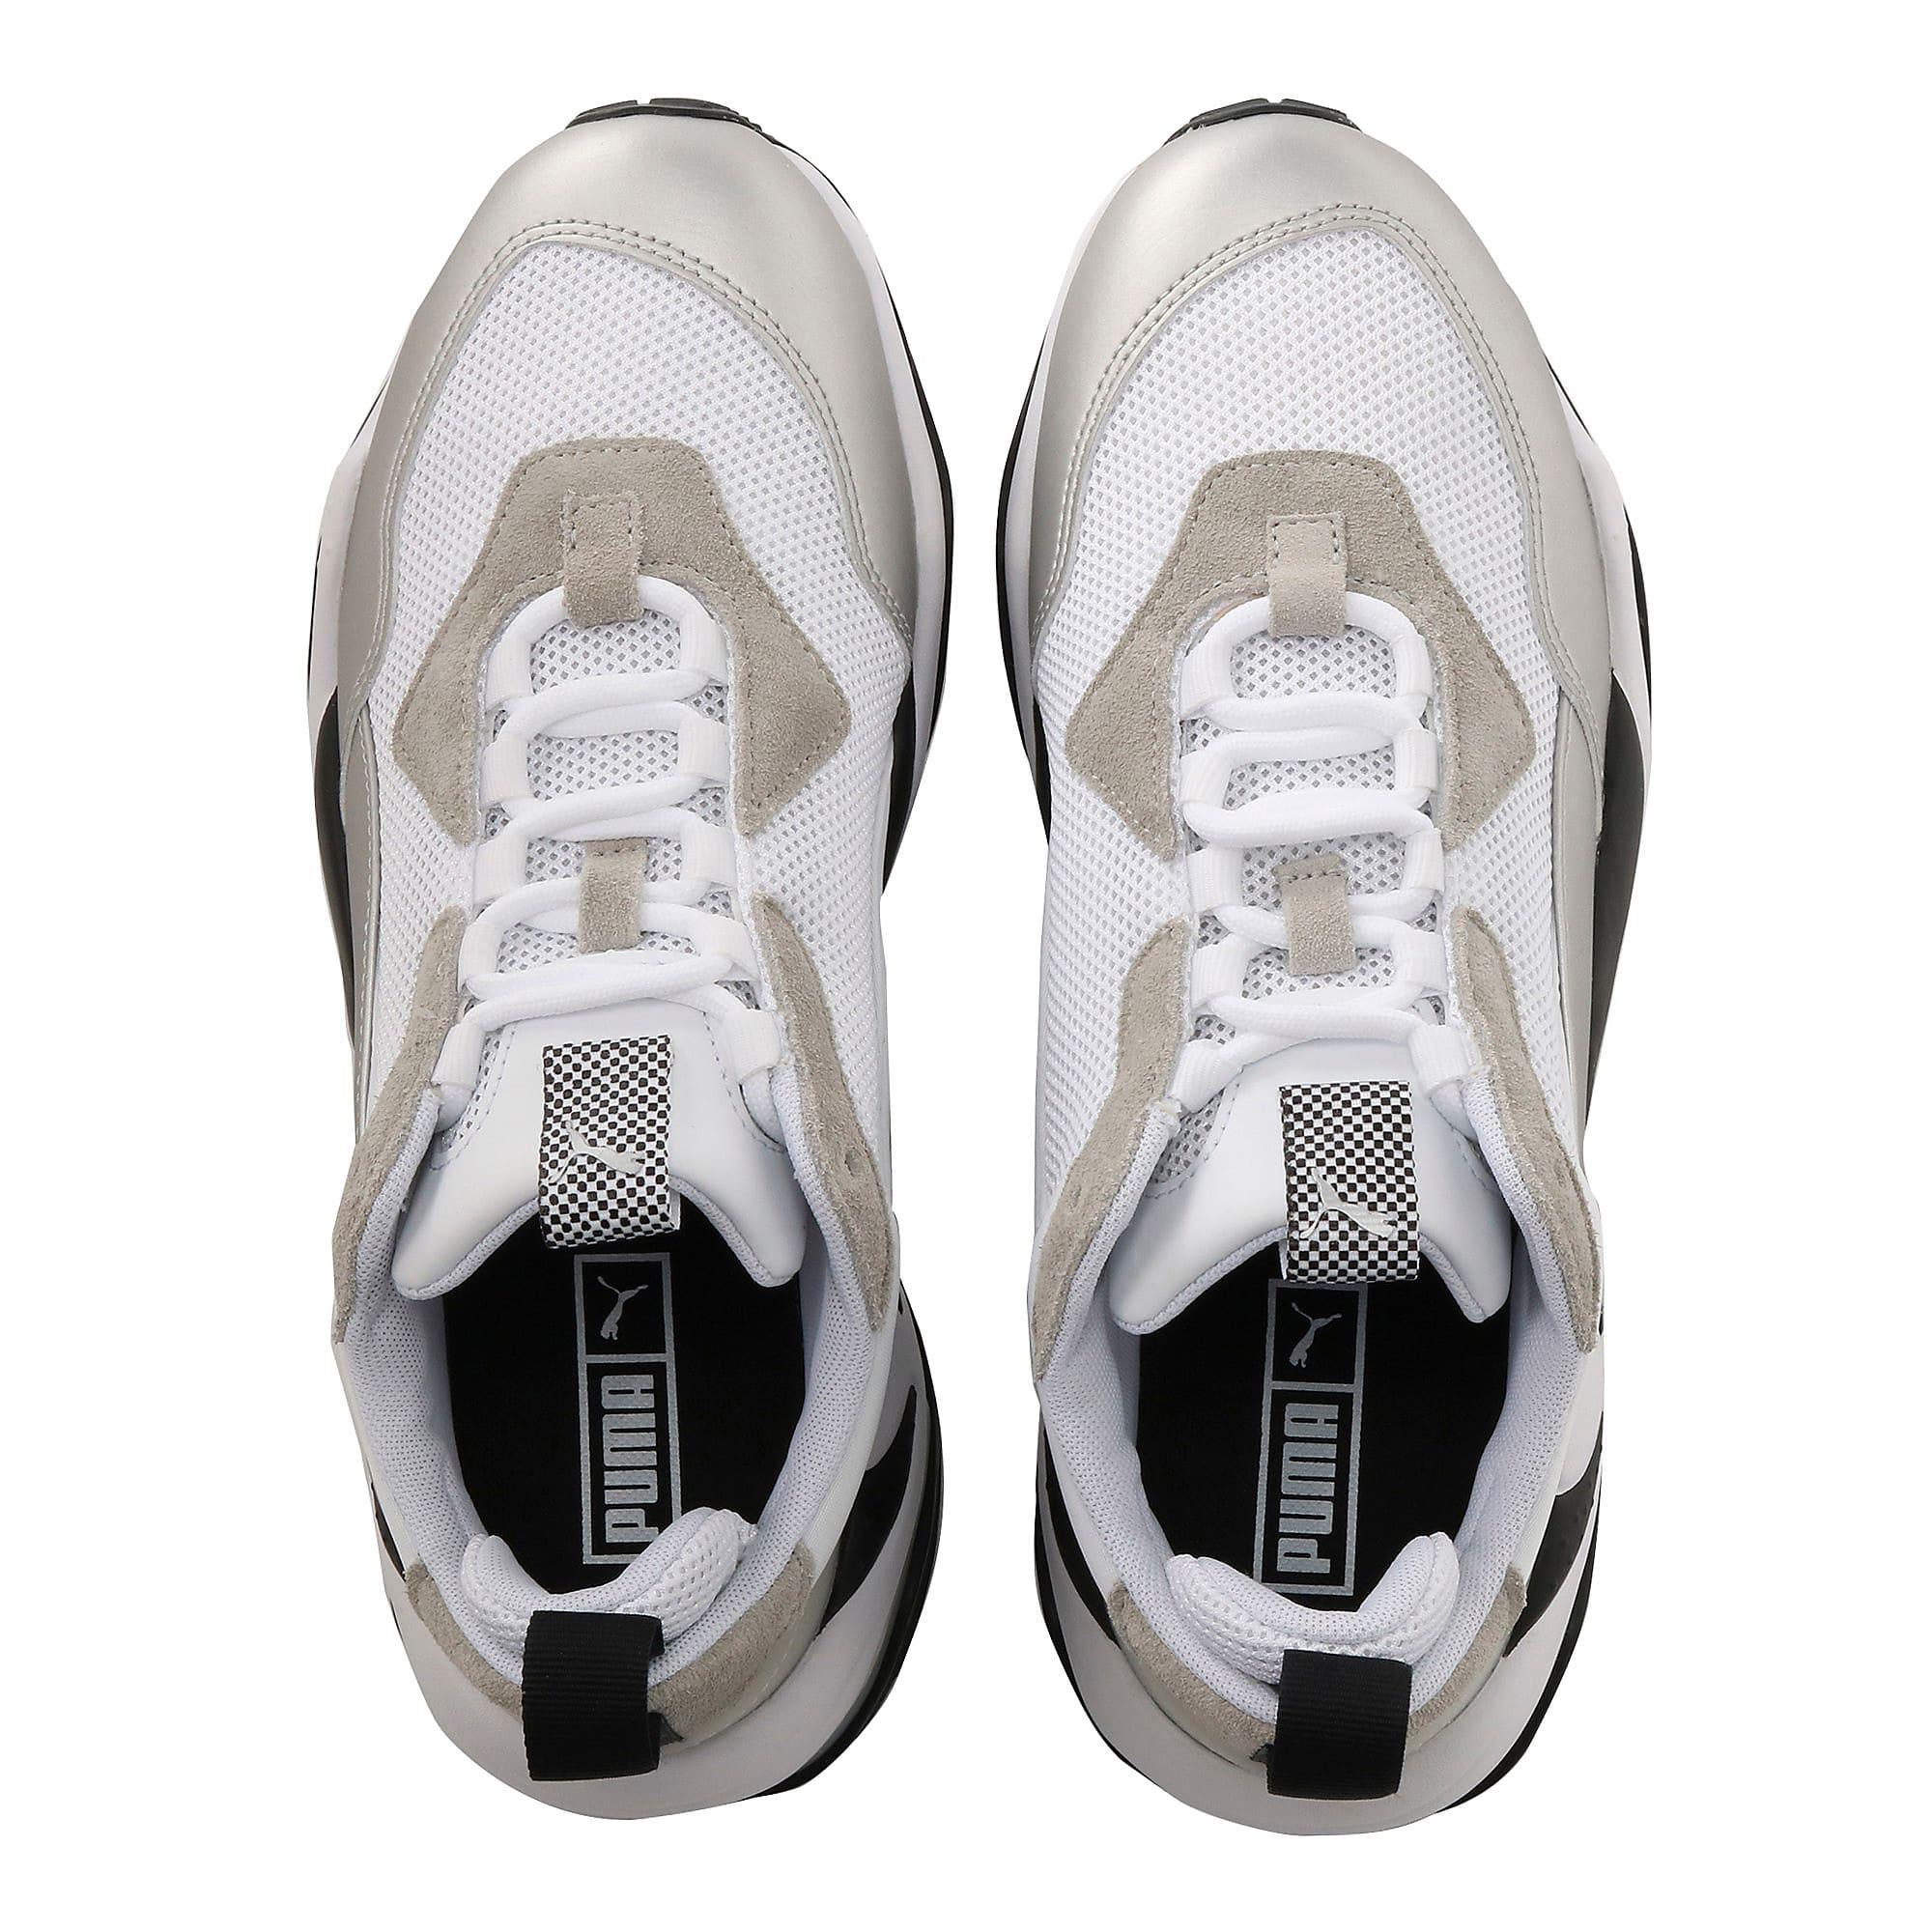 Thumbnail 6 of BMW MMS Thunder Sneakers, Puma White-Puma Silver, medium